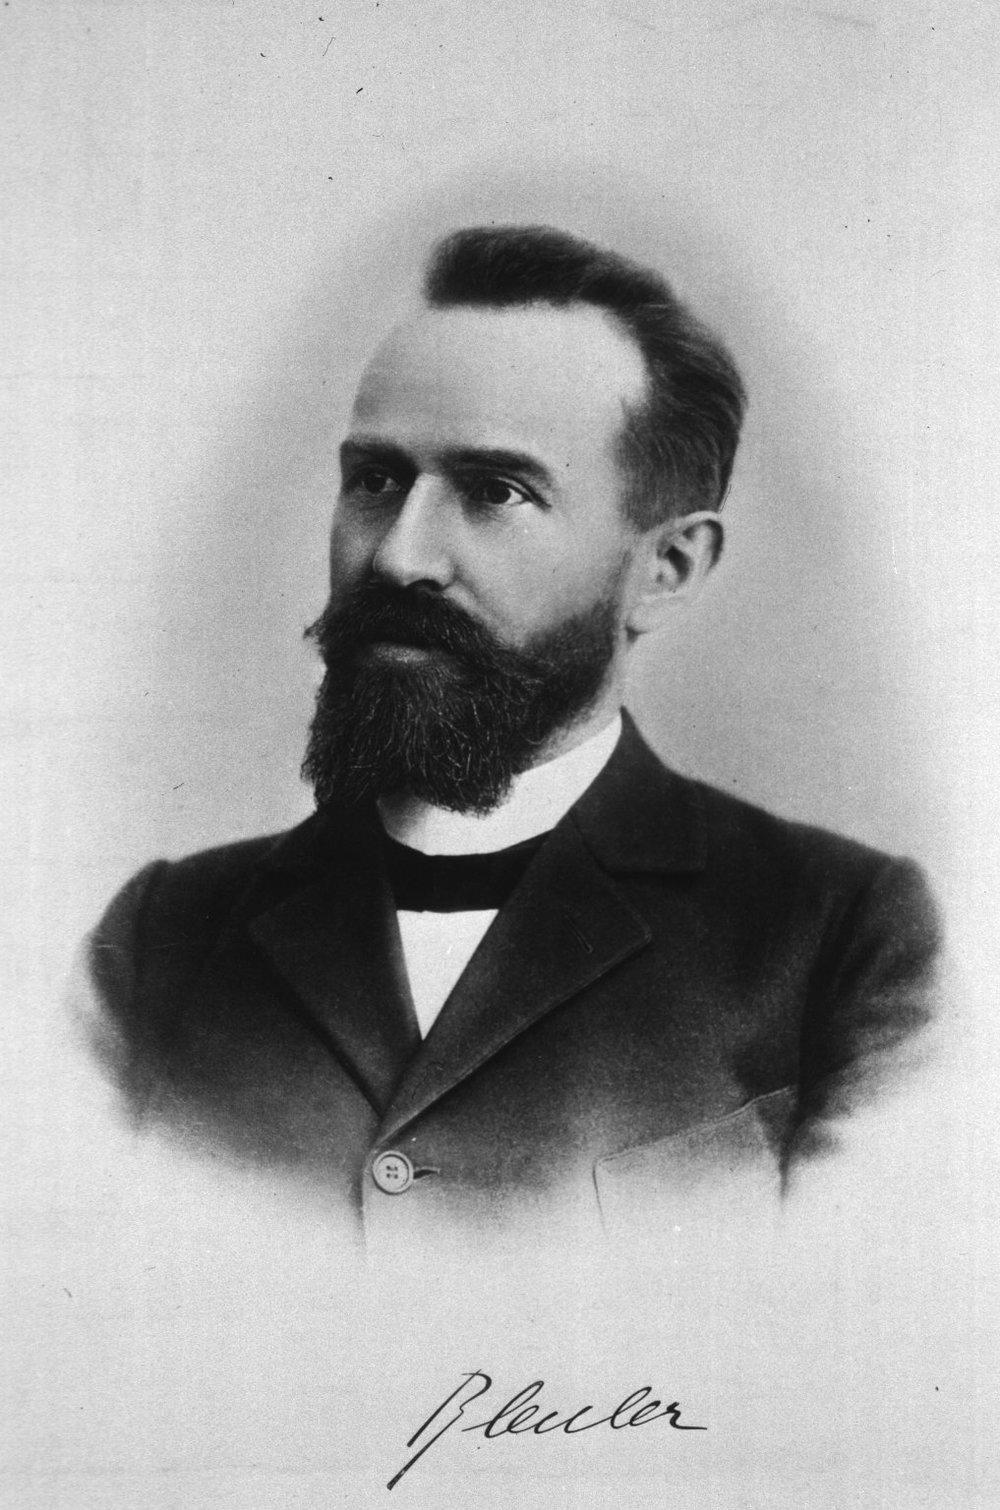 Swiss psychiatrist Eugen Bleuler, circa 1900, who coined the term schizophrenia.   Unknown photographer/Wikimedia Commons  (public domain)